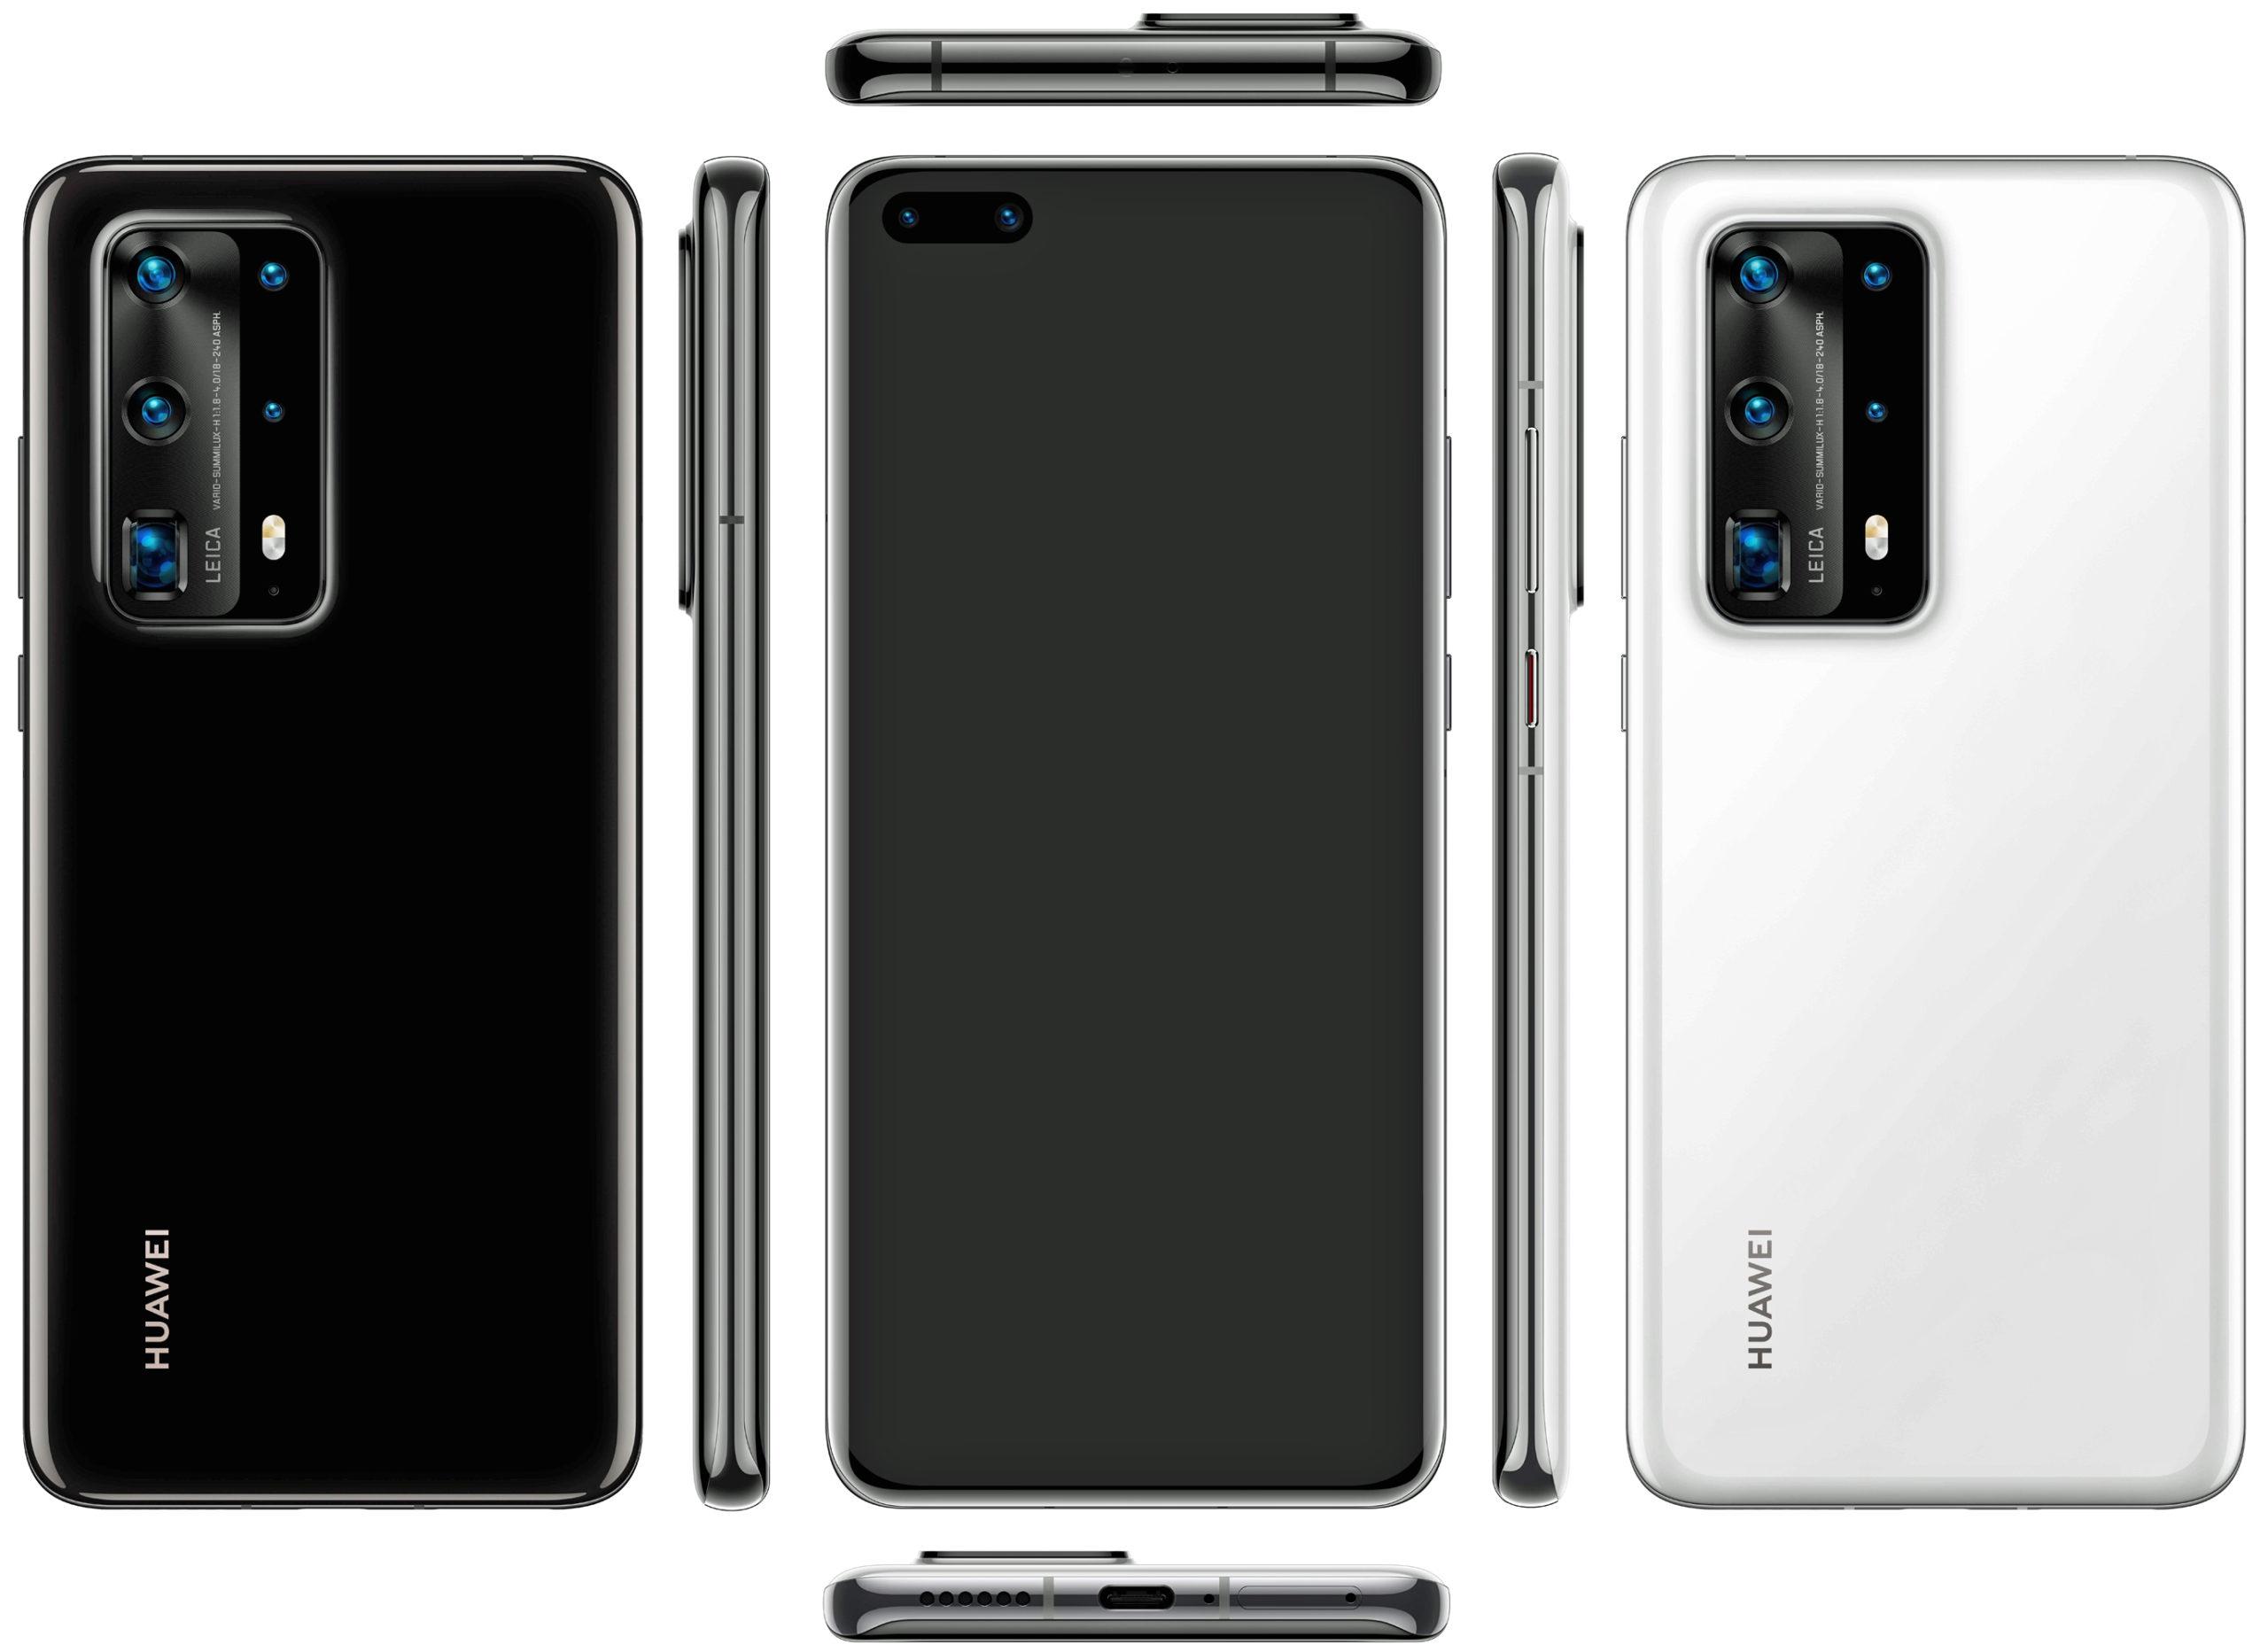 Обзор смартфона Huawei P40 Pro Premium с основными характеристиками